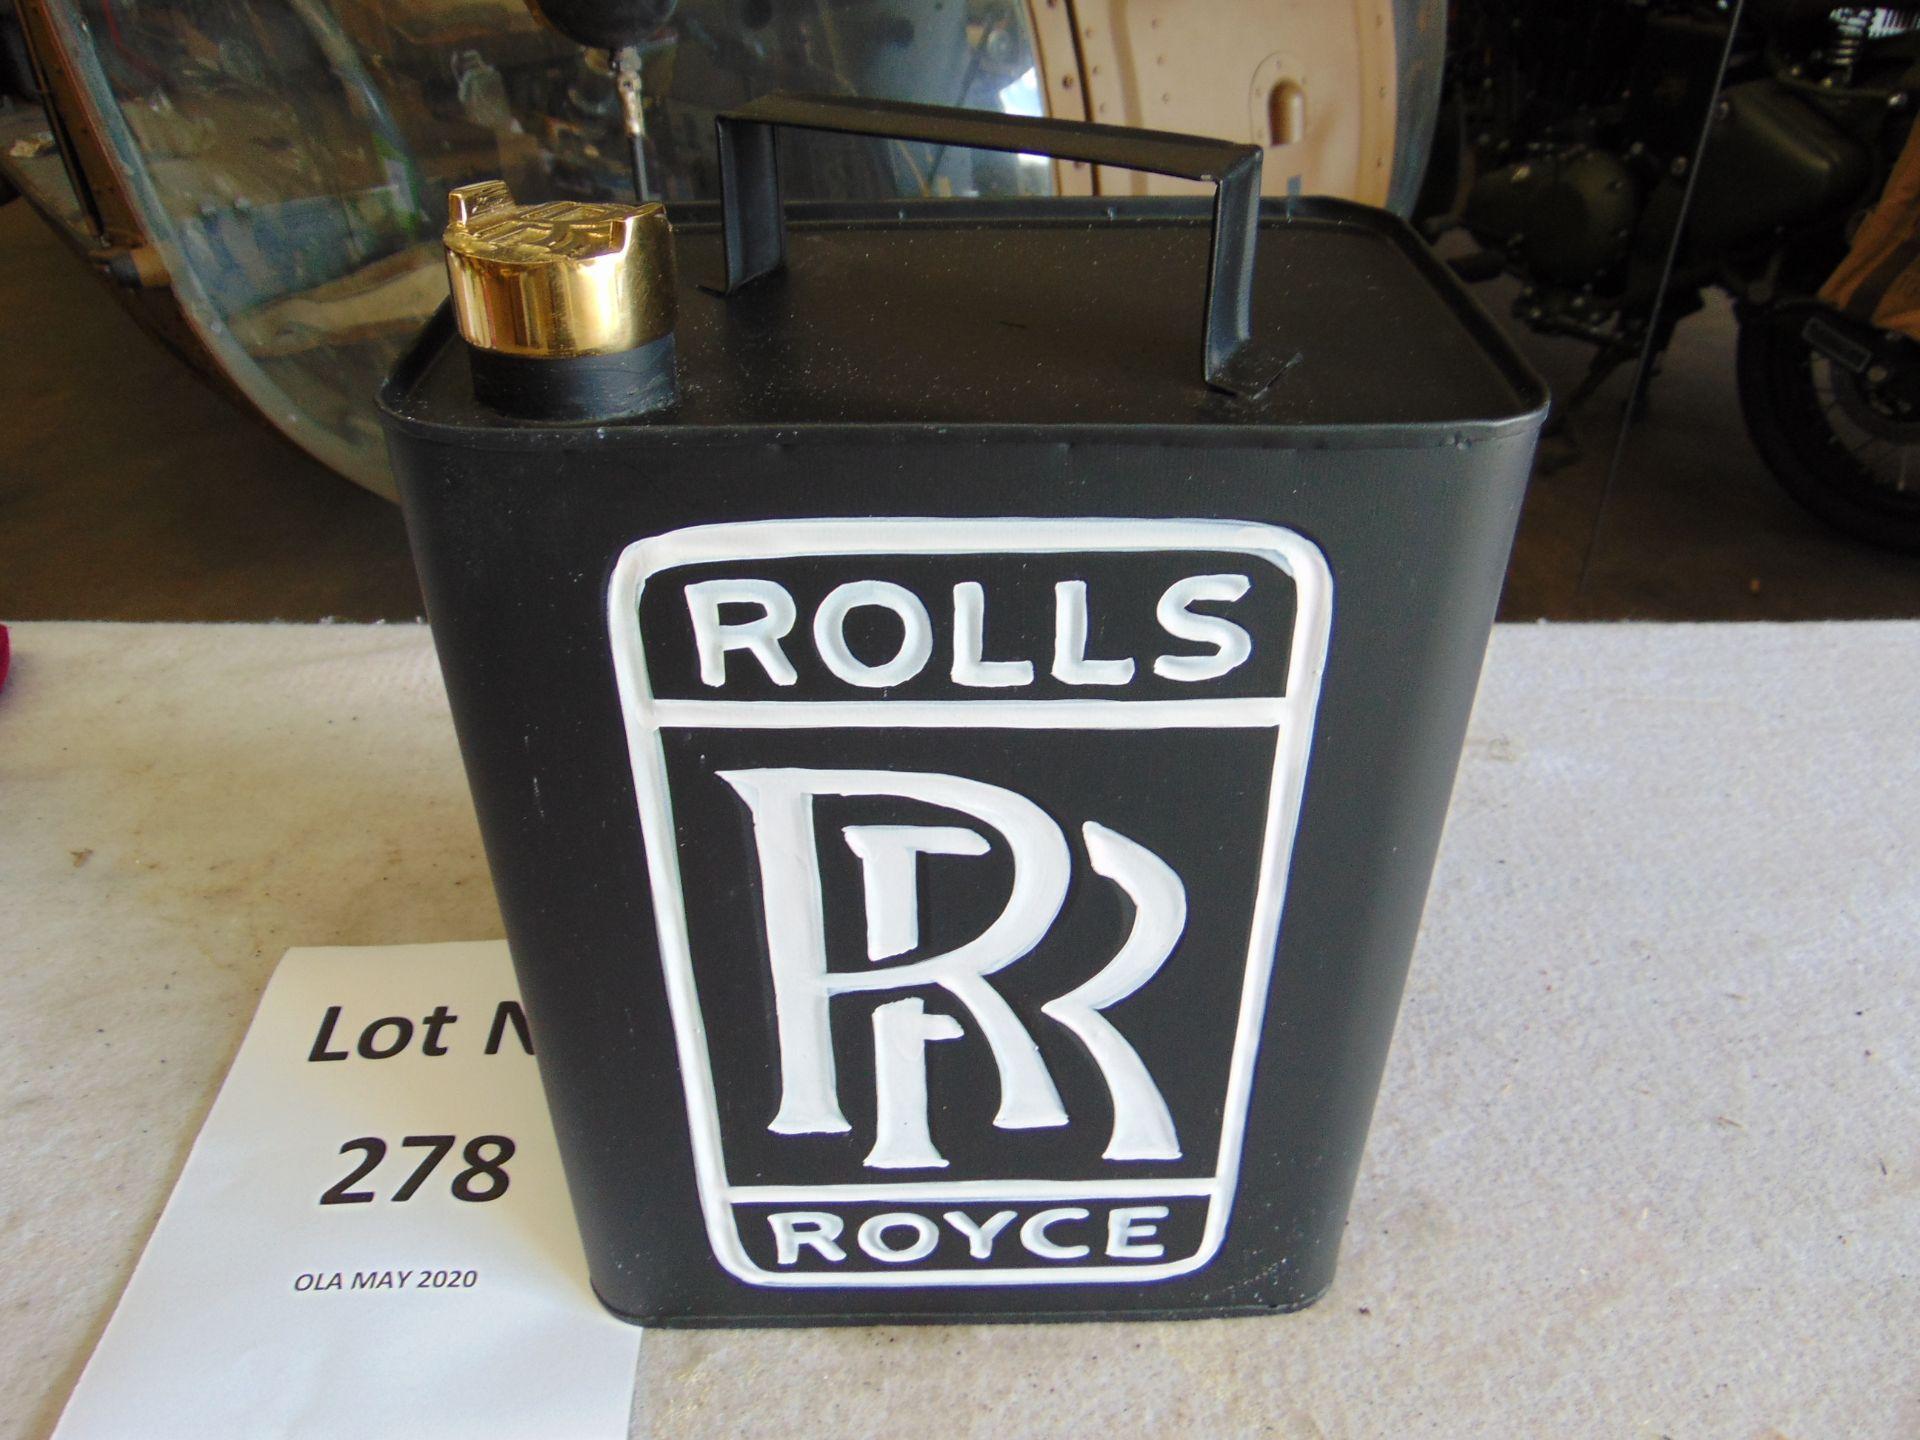 Lot 278 - Unused Rolls Royce Fuel/Oil Can with brass screw cap